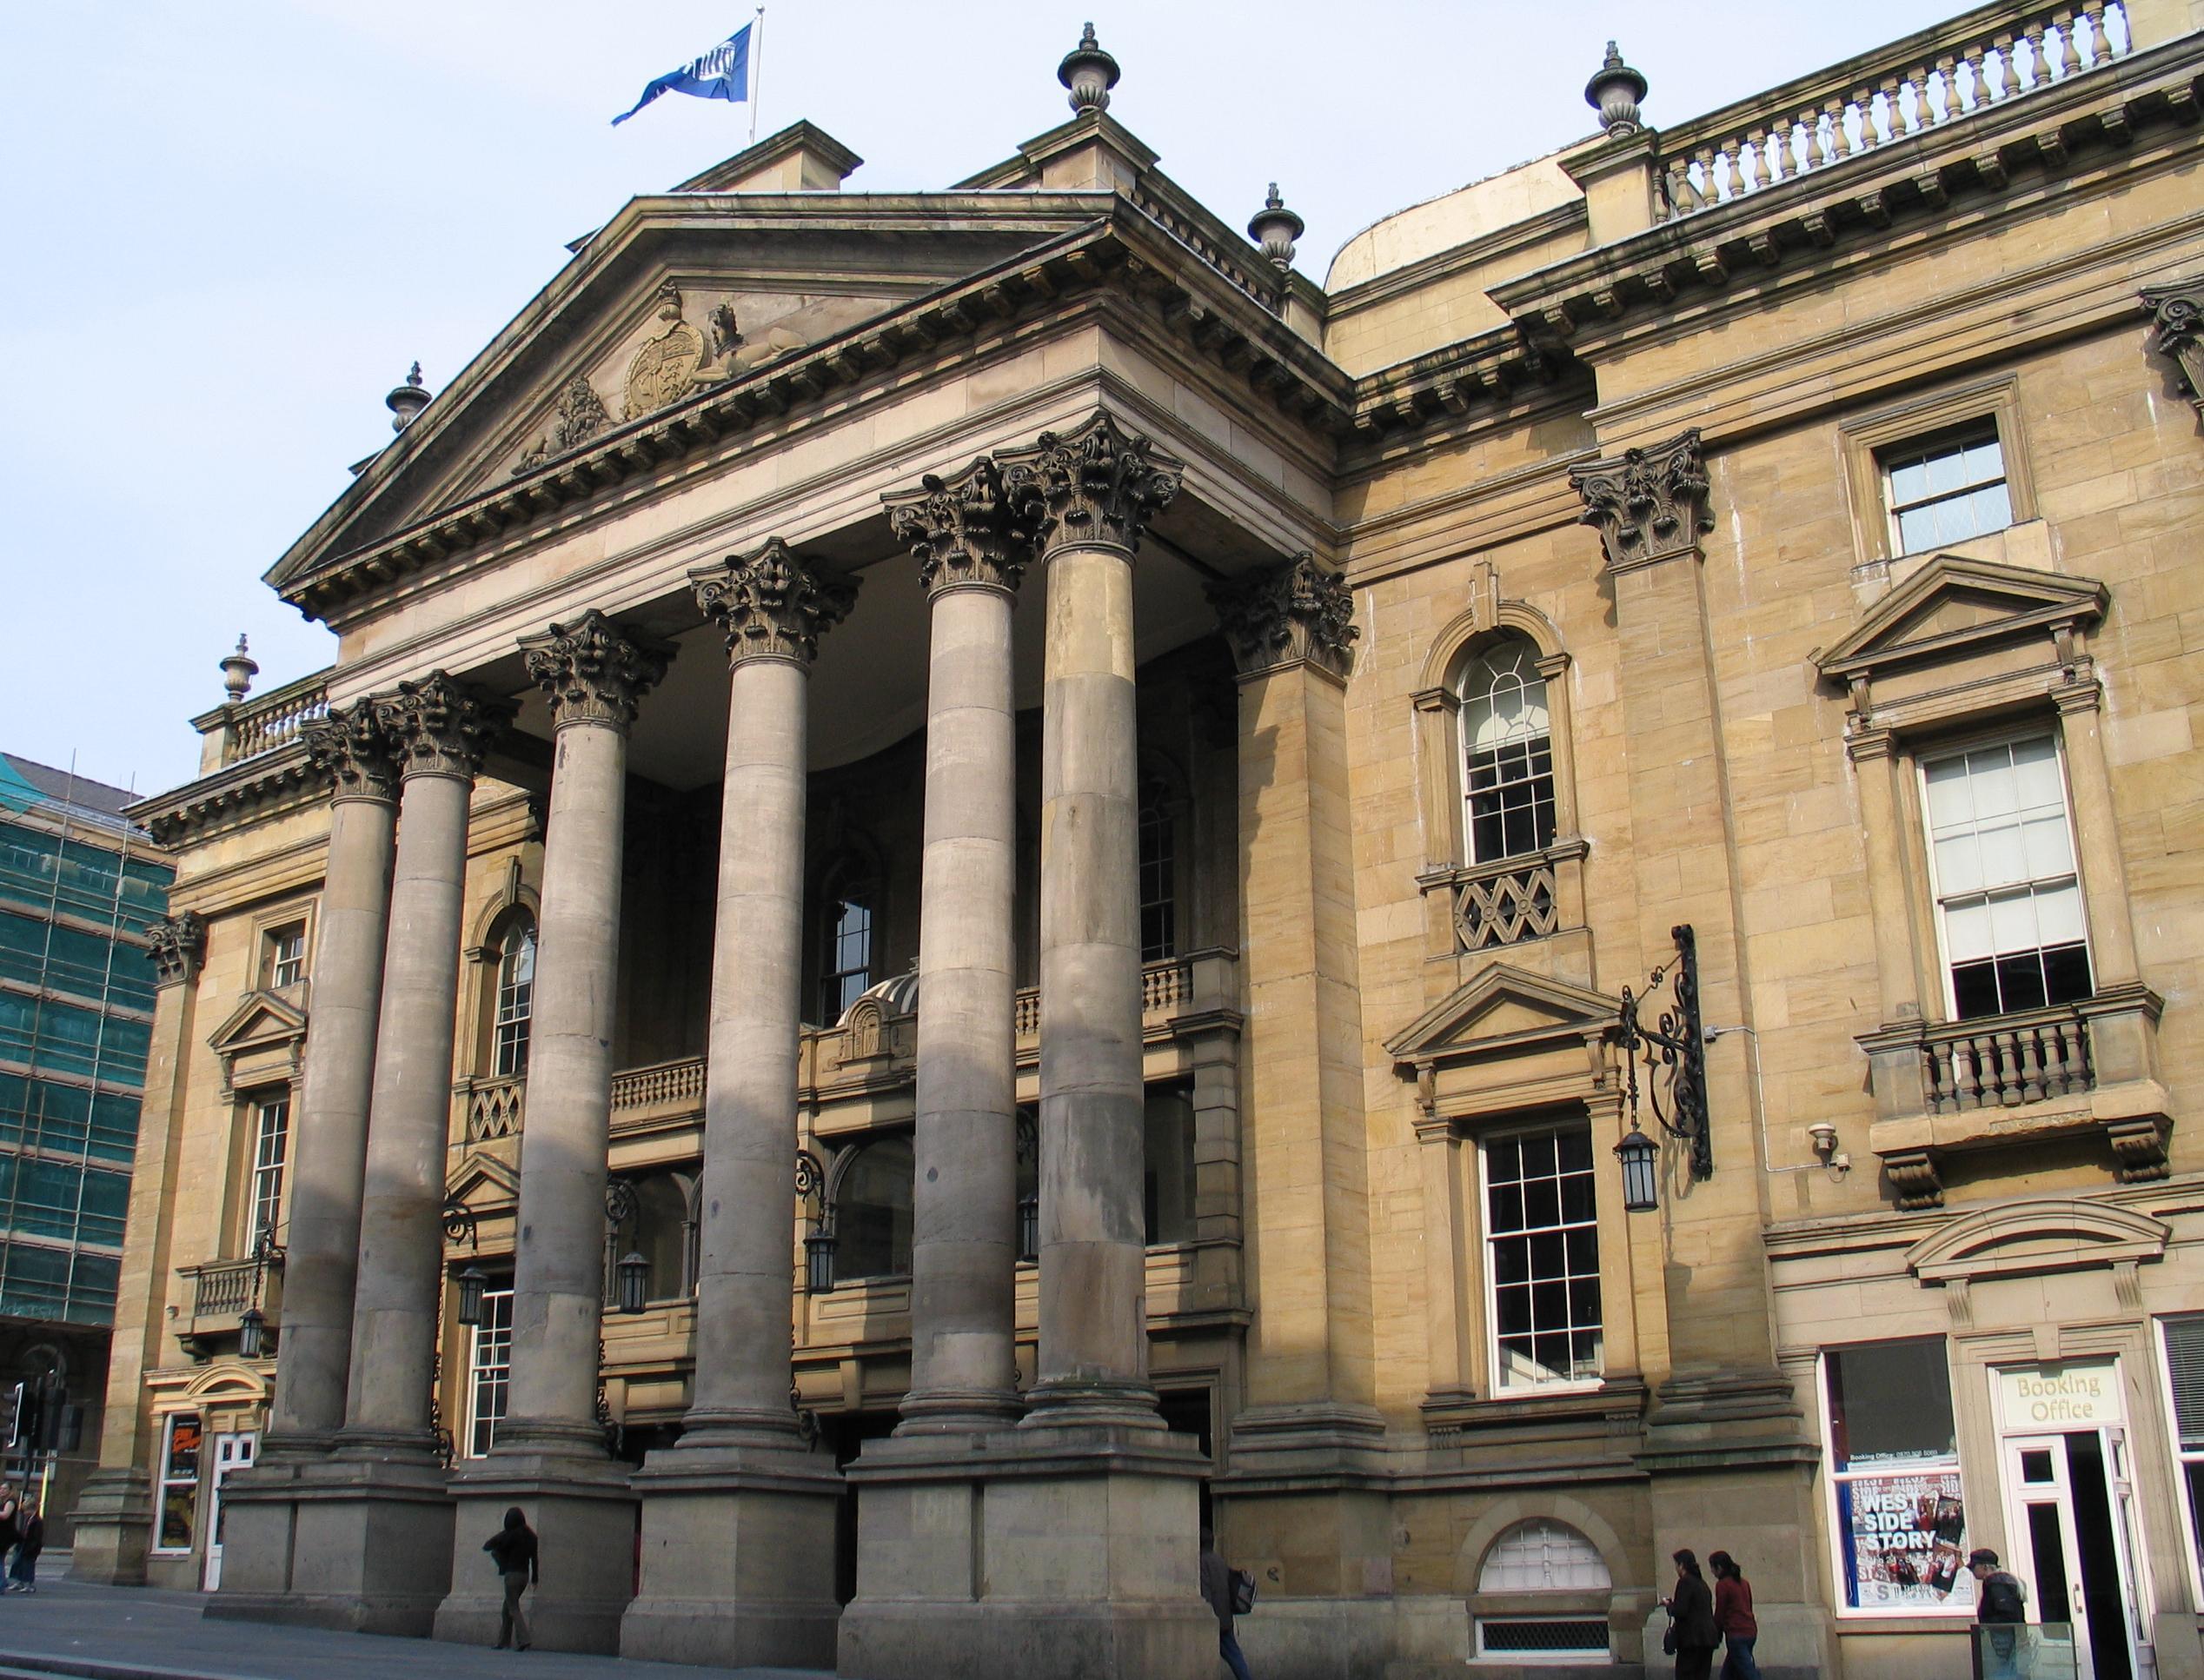 Theatre_Royal,_Newcastle_upon_Tyne.jpg